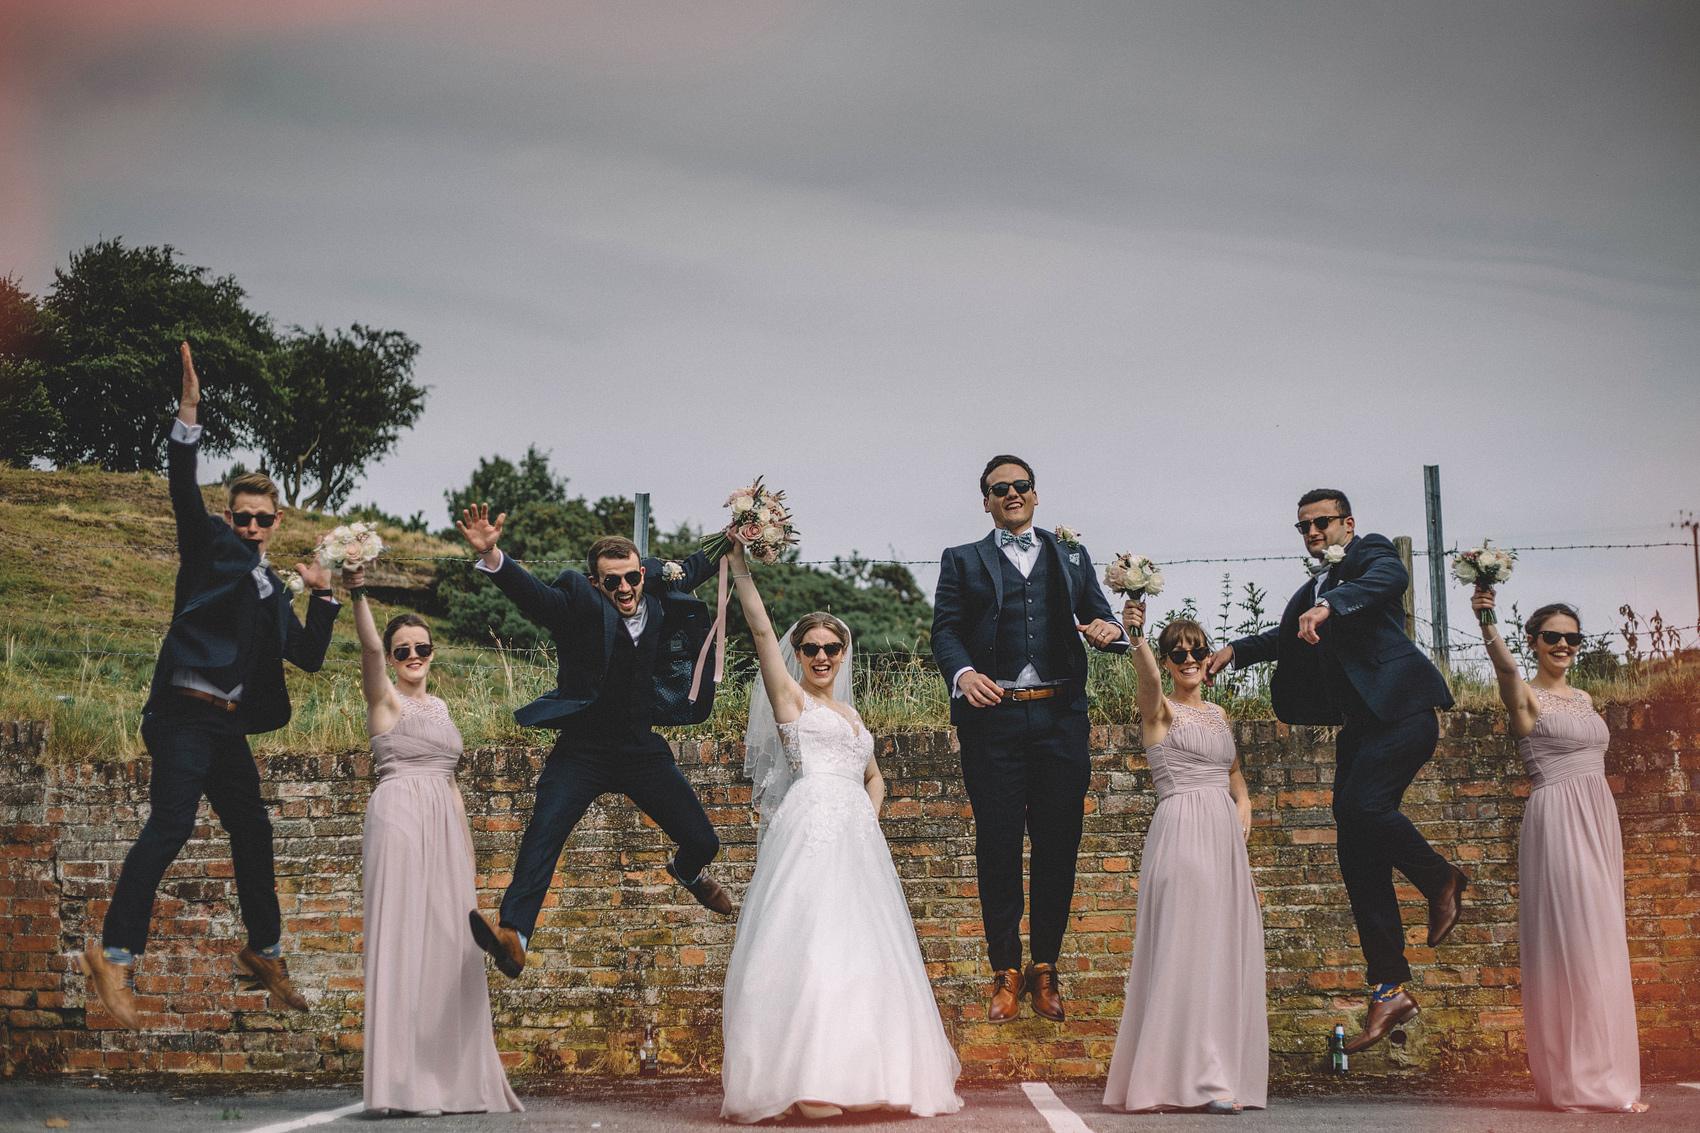 Dilhorne_Village_Hall_Wedding_Photography_-_46_.jpg